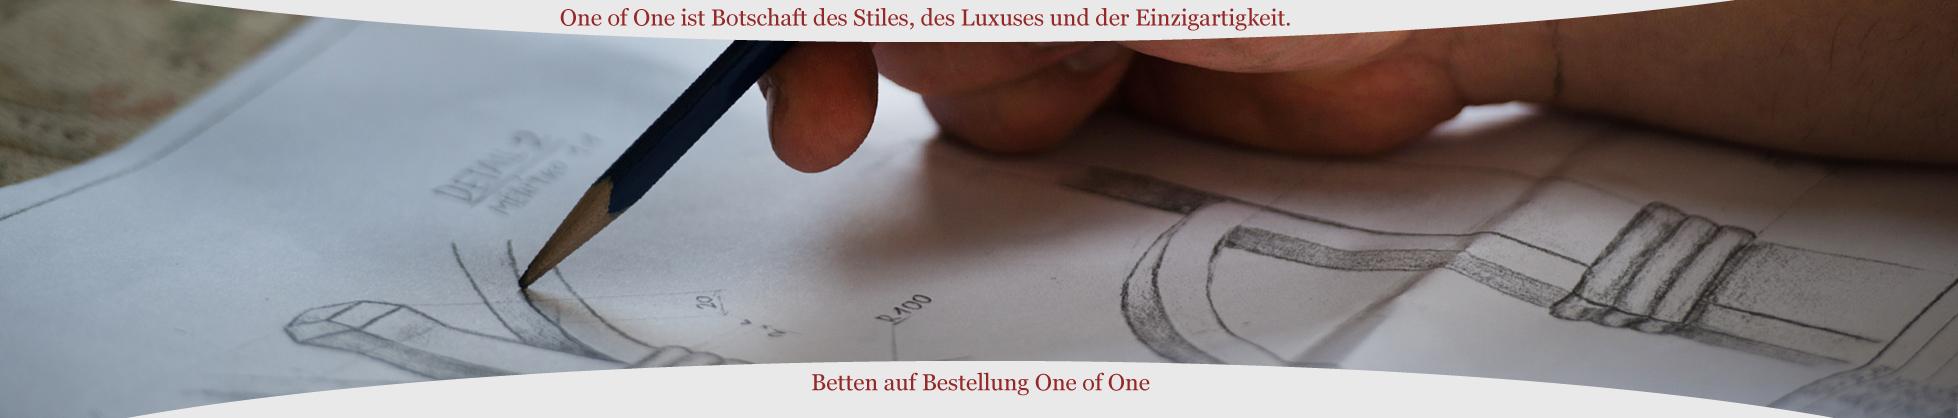 copy-german